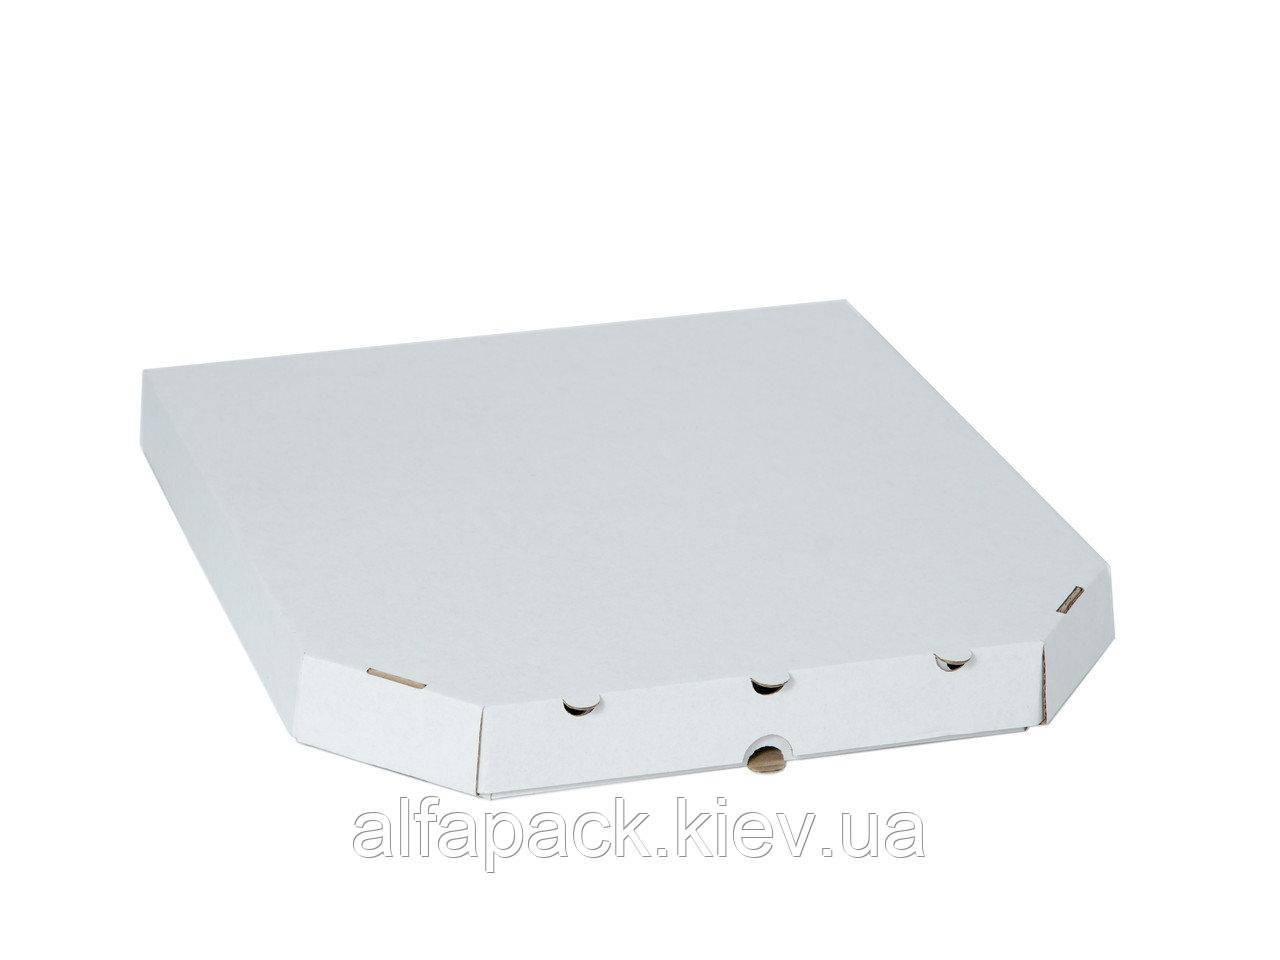 Коробка для пиццы белая, 320х320х35 мм, 50 шт.